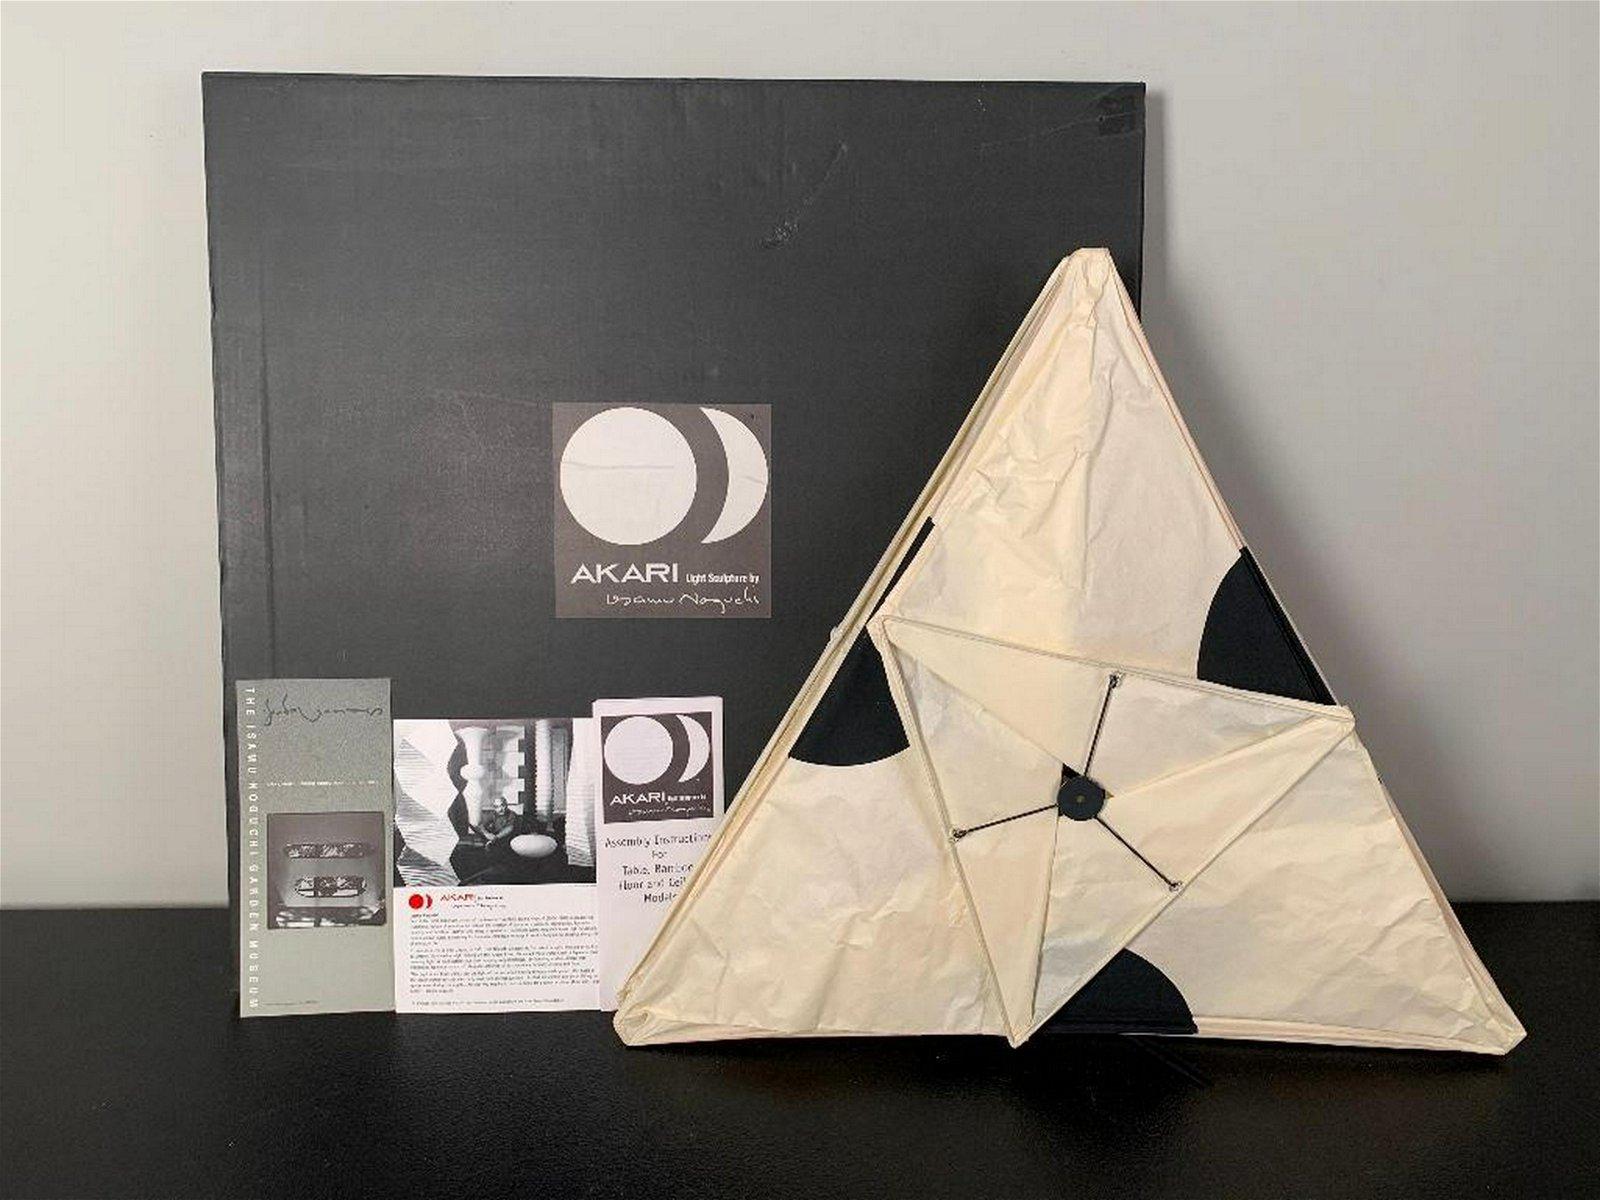 Isamu Noguchi (1904-1988) Akari Light Sculpture